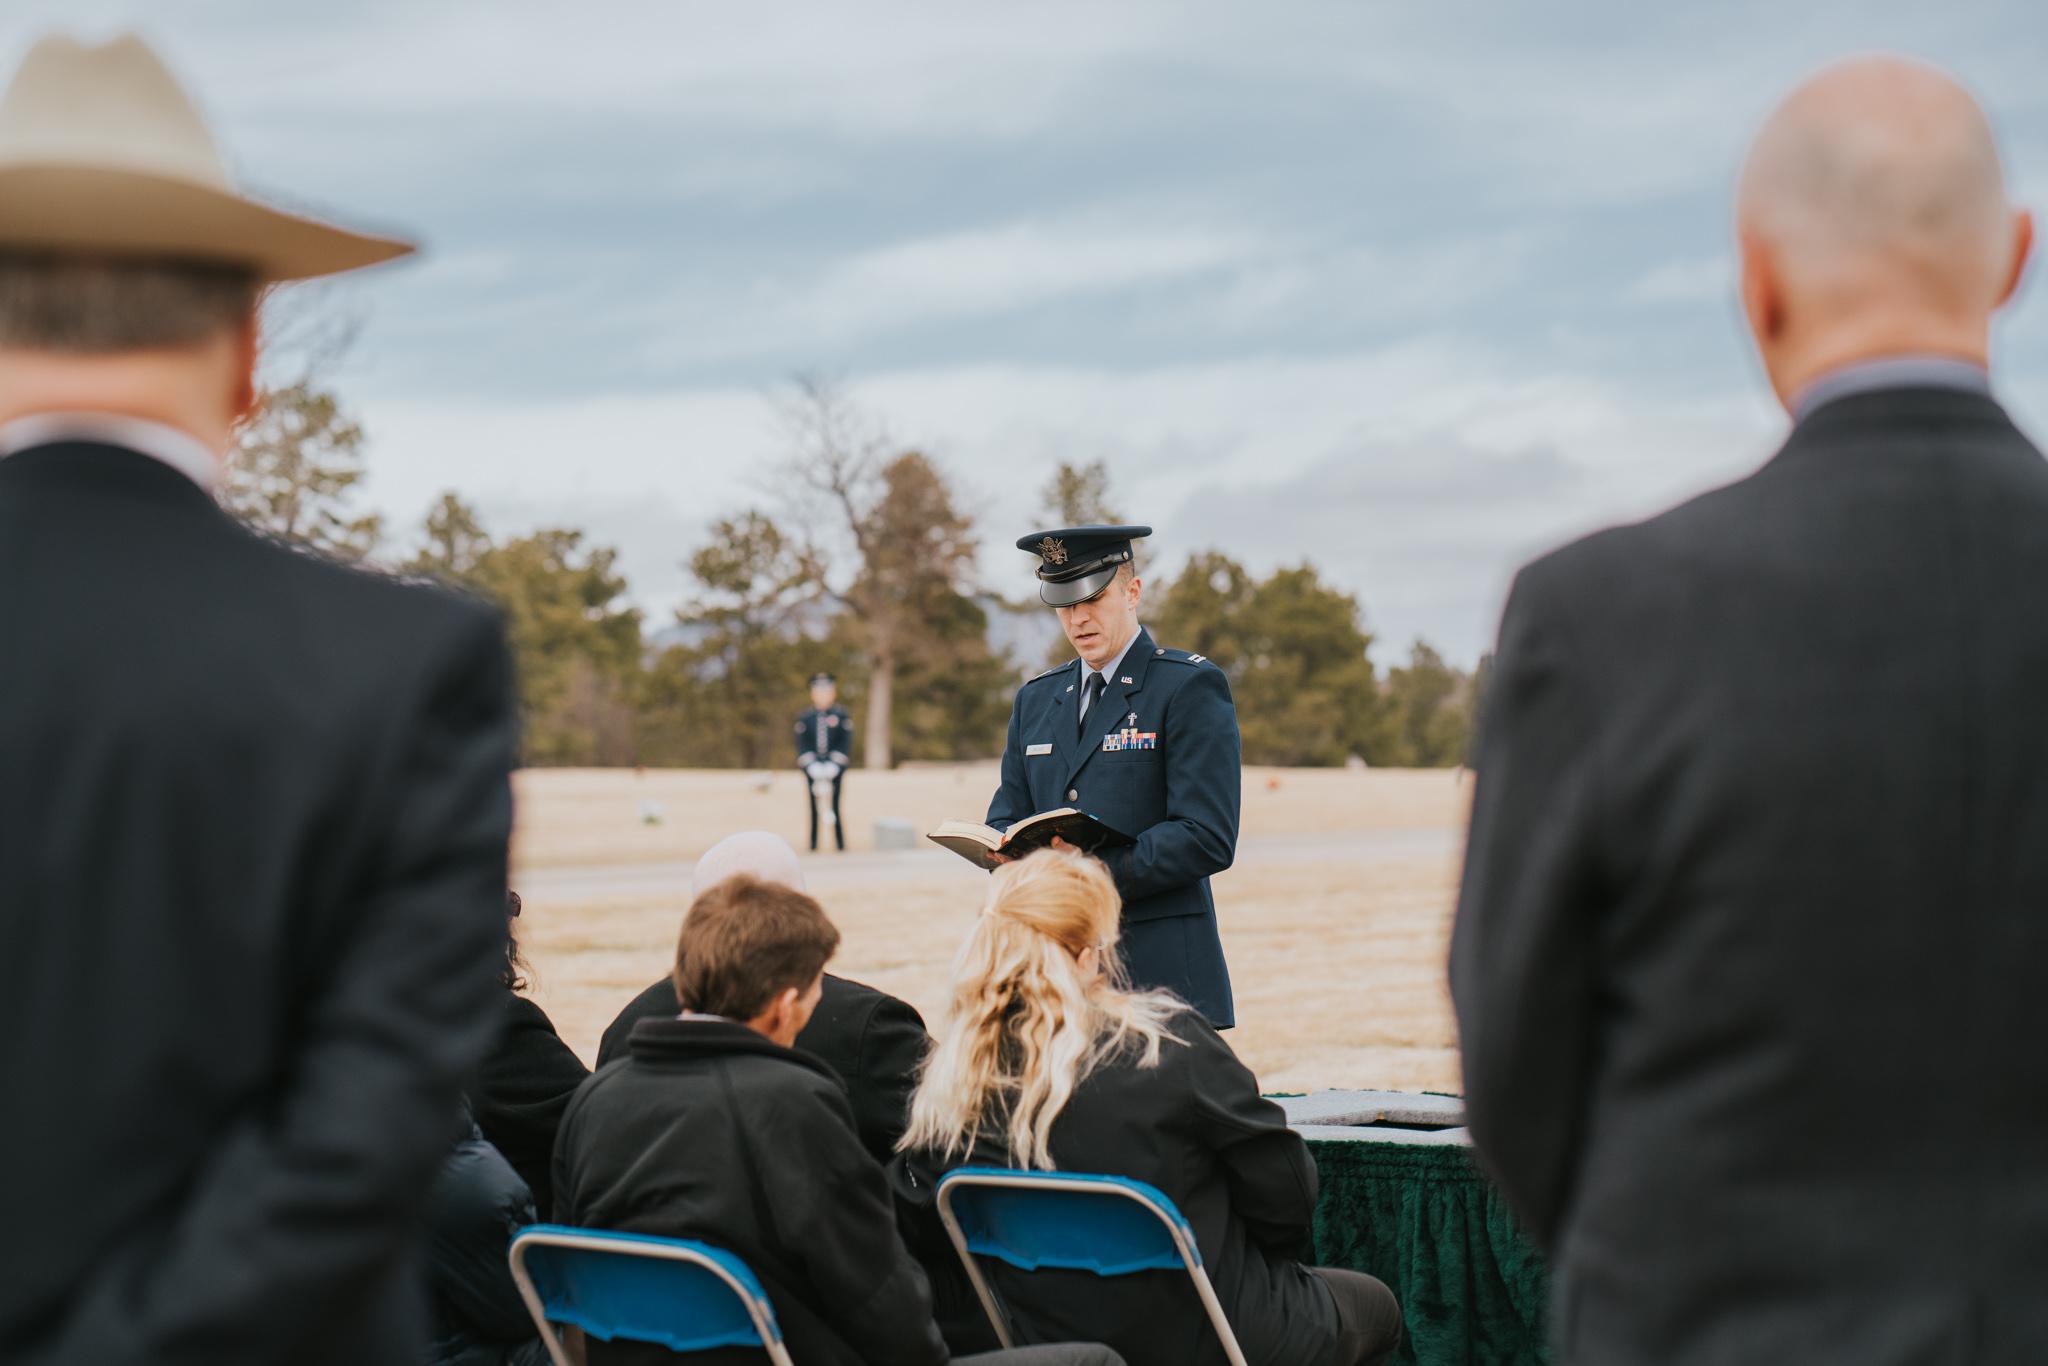 usafa-colorado-military-honours-burial-funeral-photography-grace-elizabeth-colchester-essex-alternative-wedding-lifestyle-photographer (71 of 127).jpg